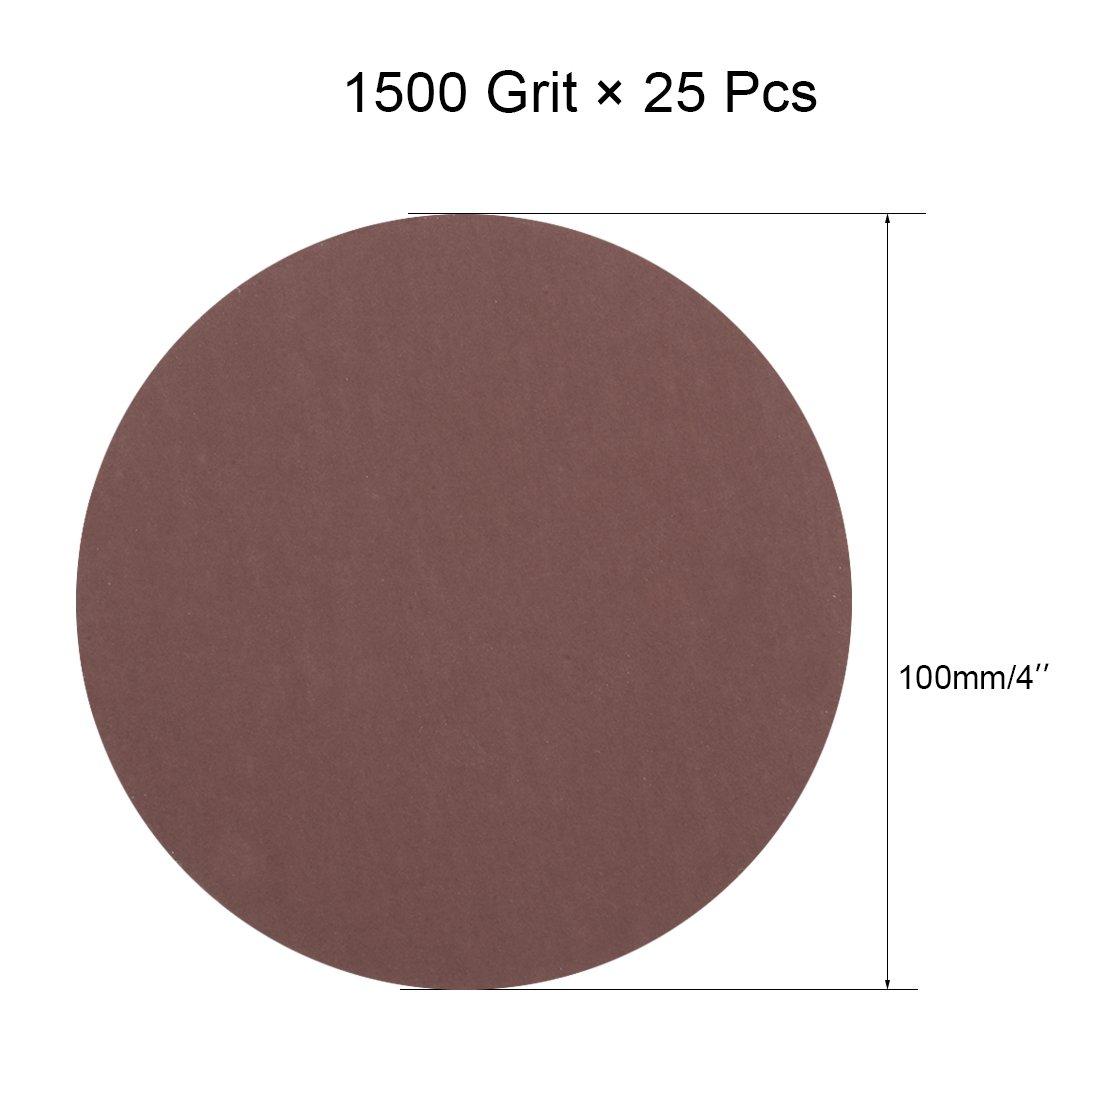 5Pcs 3 Inch Hook and Loop Sanding Disc 1500 Grits Flocking Sandpaper Brown